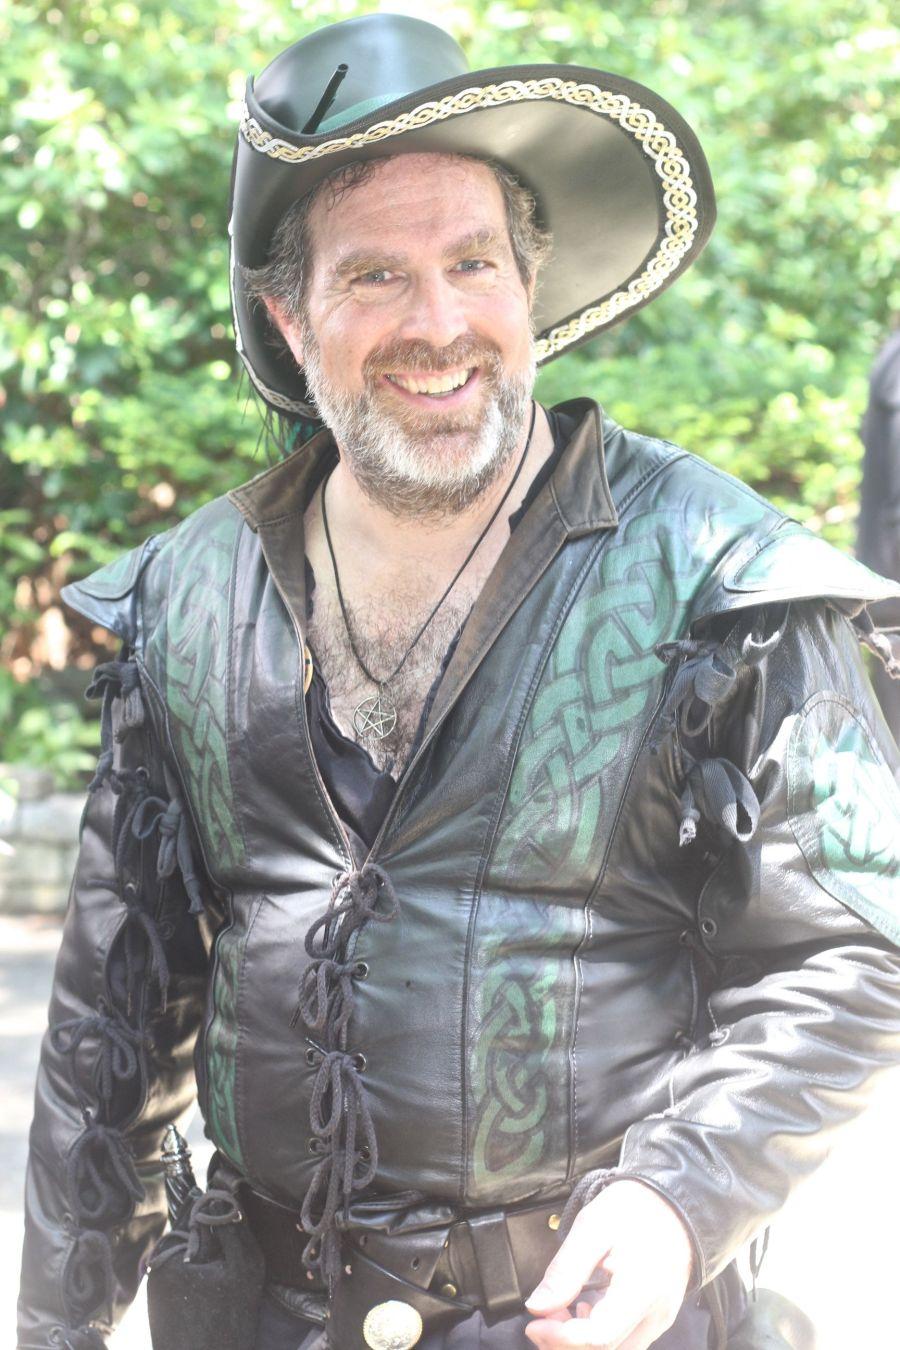 gloucester hammond castle renaissance fair man in leather outfit